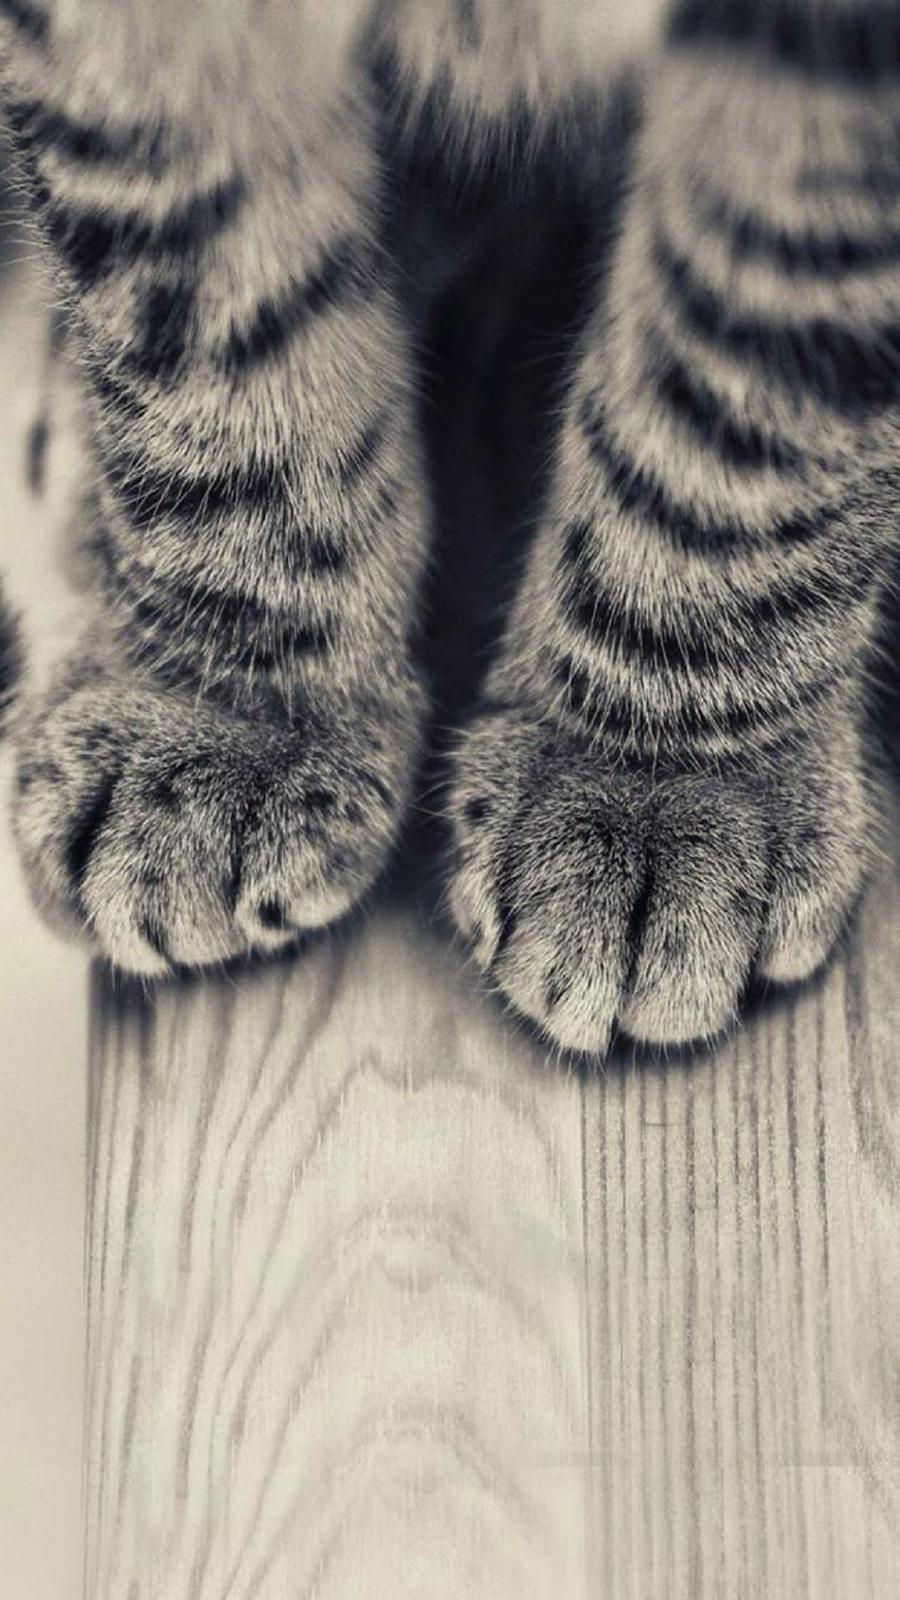 Gray Striped Kitten Legs Cat Android Wallpaper